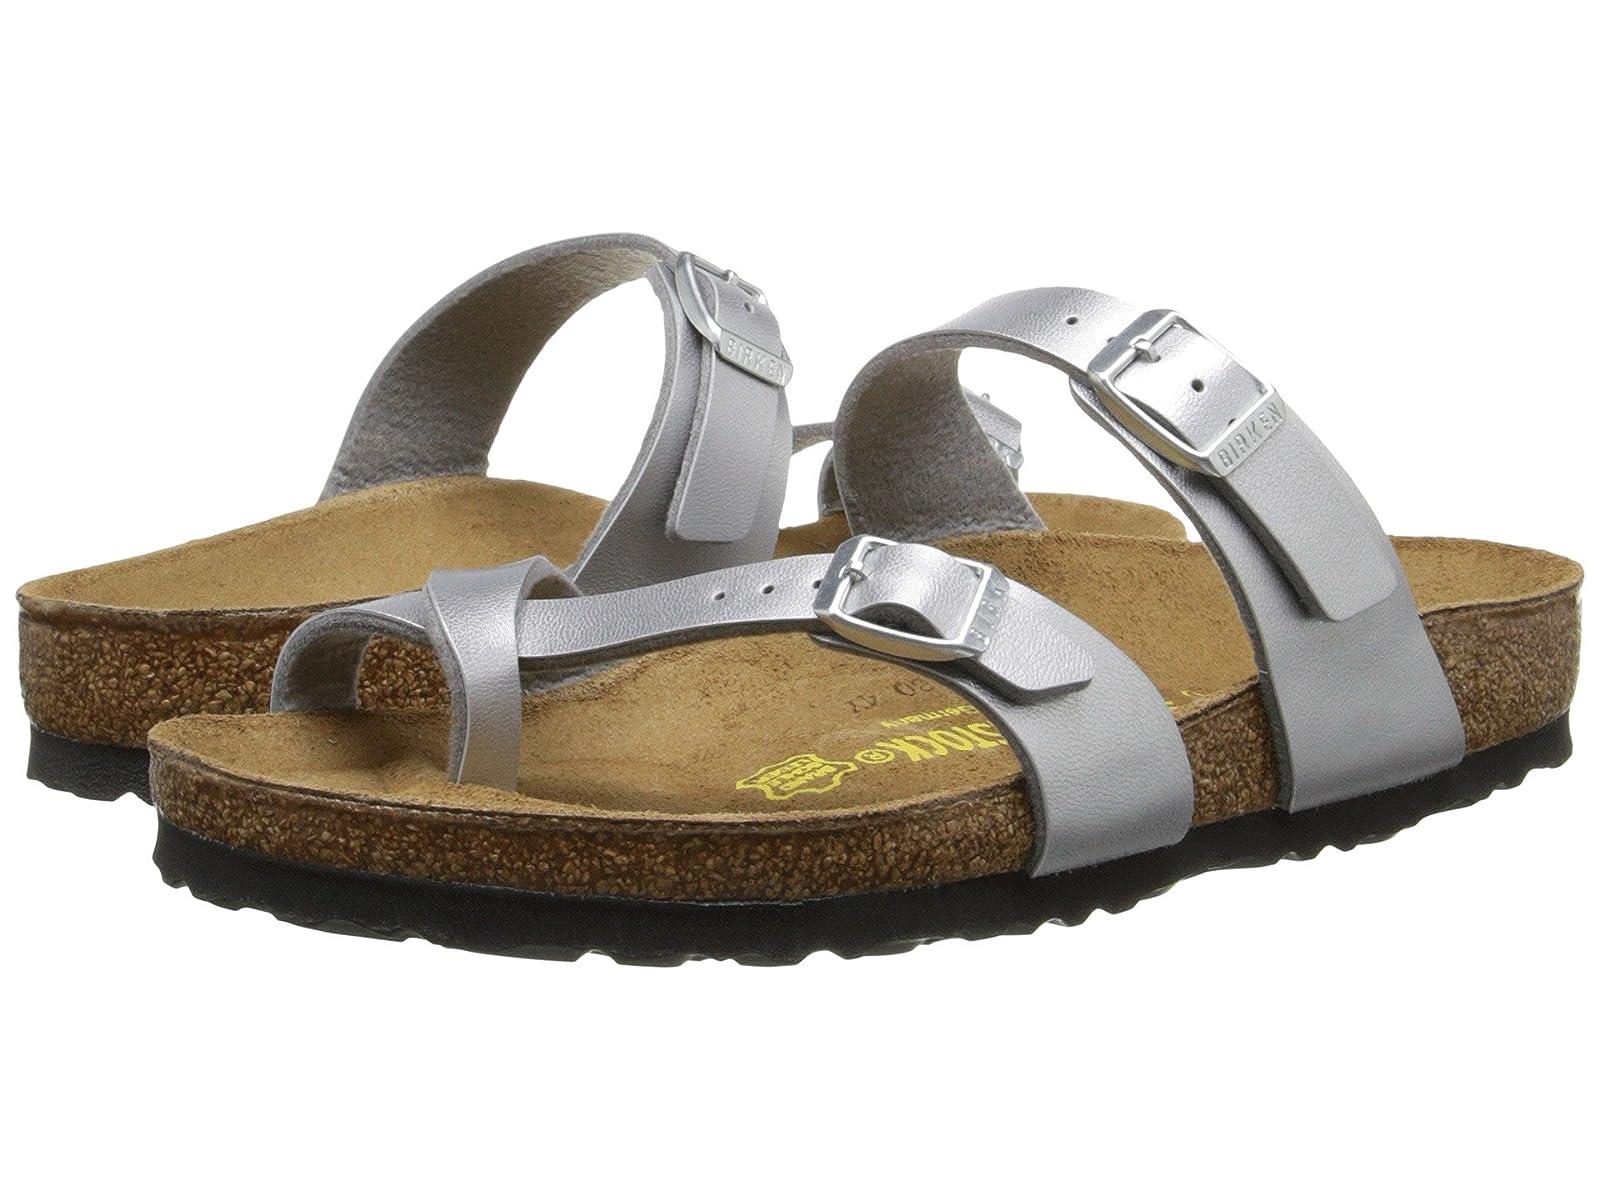 Birkenstock MayariComfortable and distinctive shoes